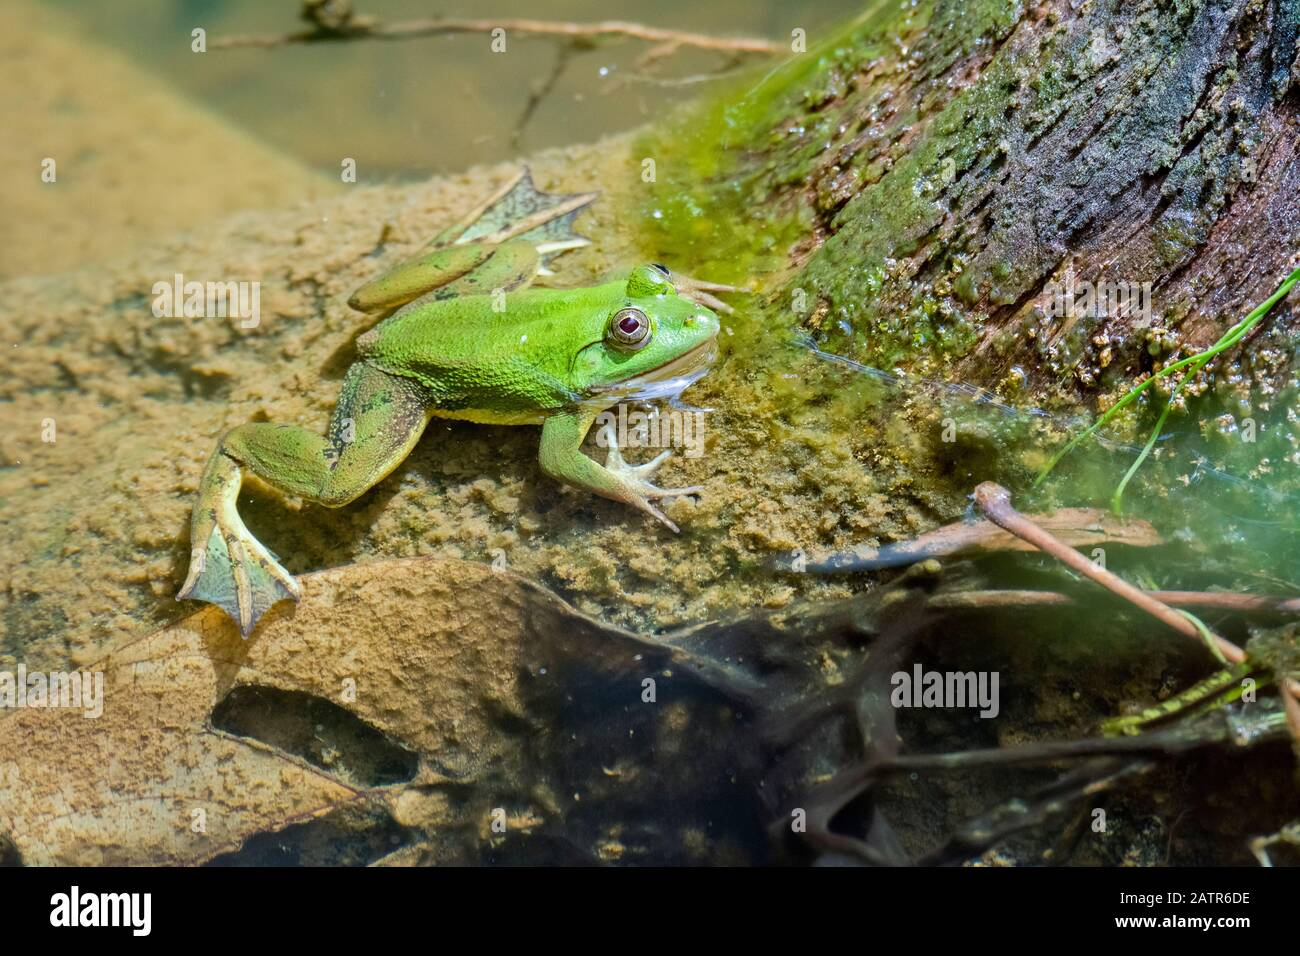 Euphlyctis hexadactylus grenouille vert indien, le Parc National de Sinharaja, Sri Lanka Banque D'Images